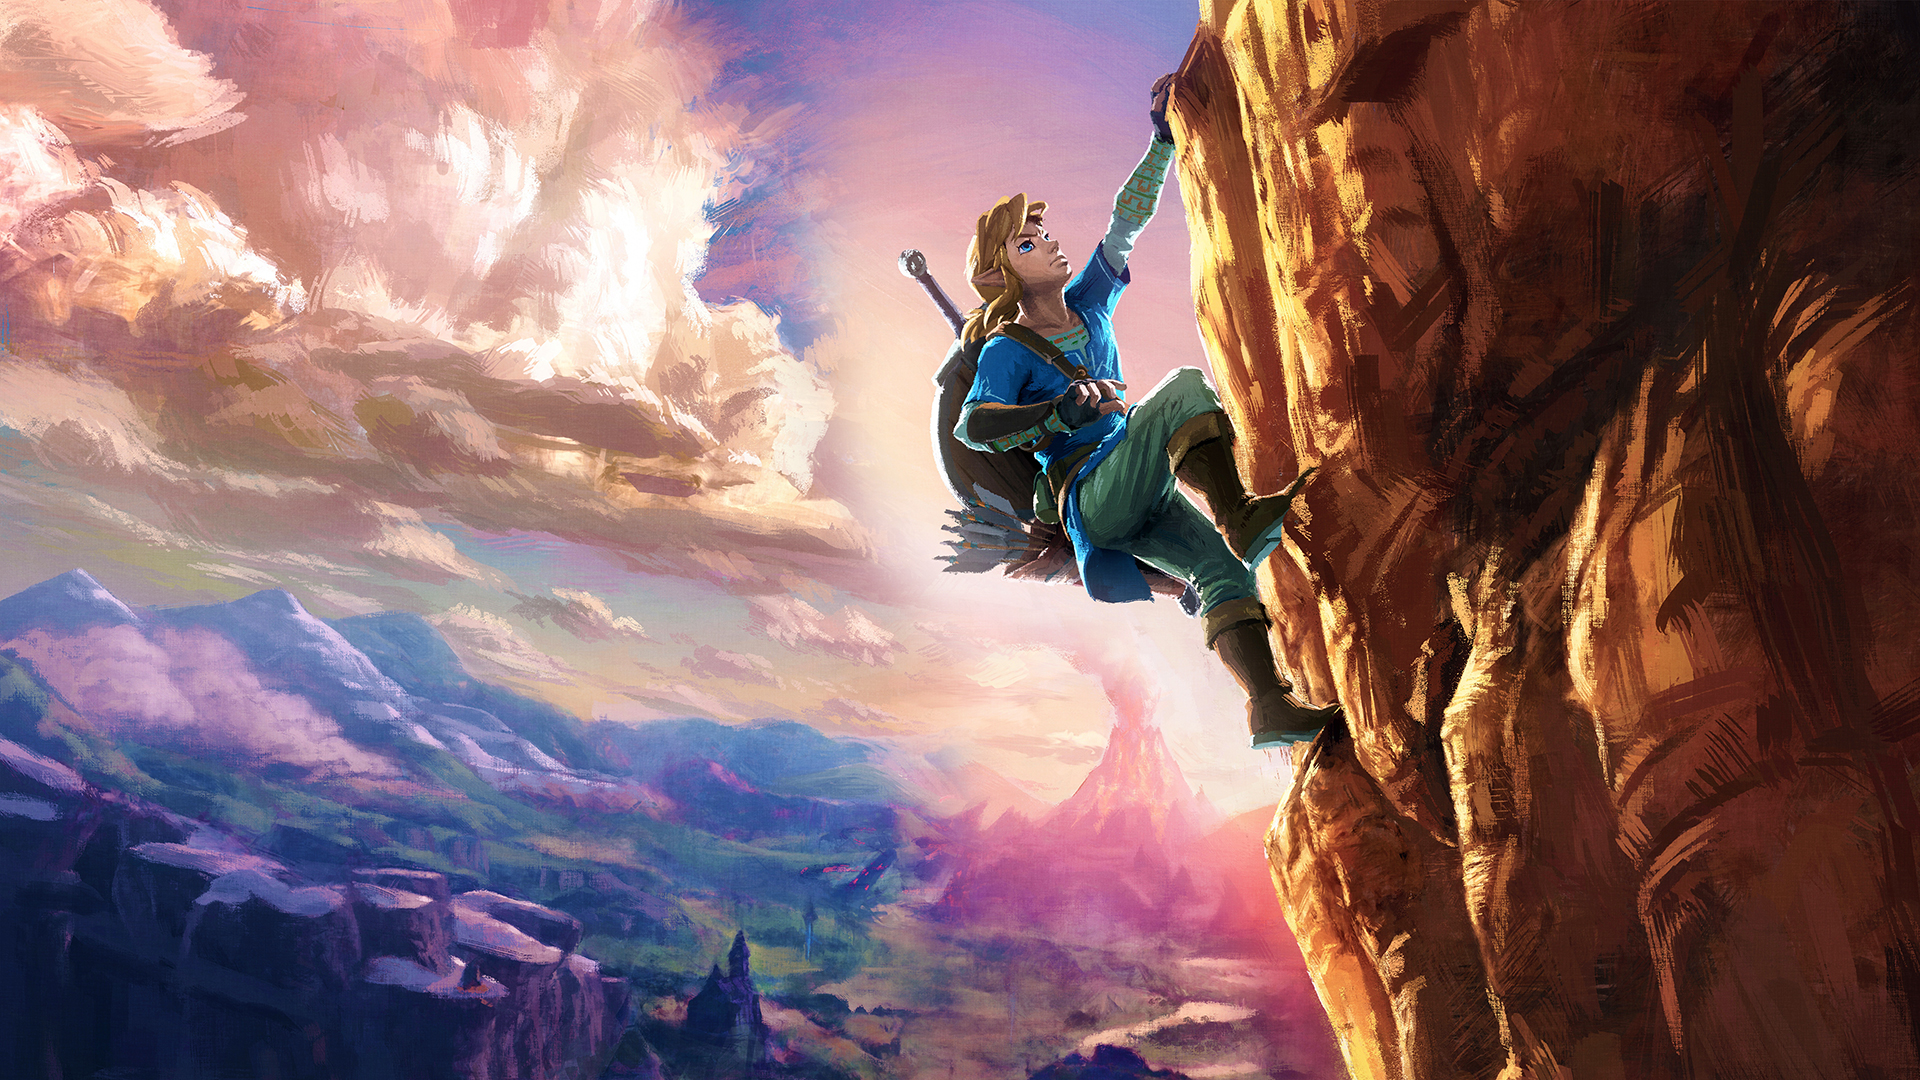 The Legend Of Zelda Breath Of The Wild Chromebook Wallpaper